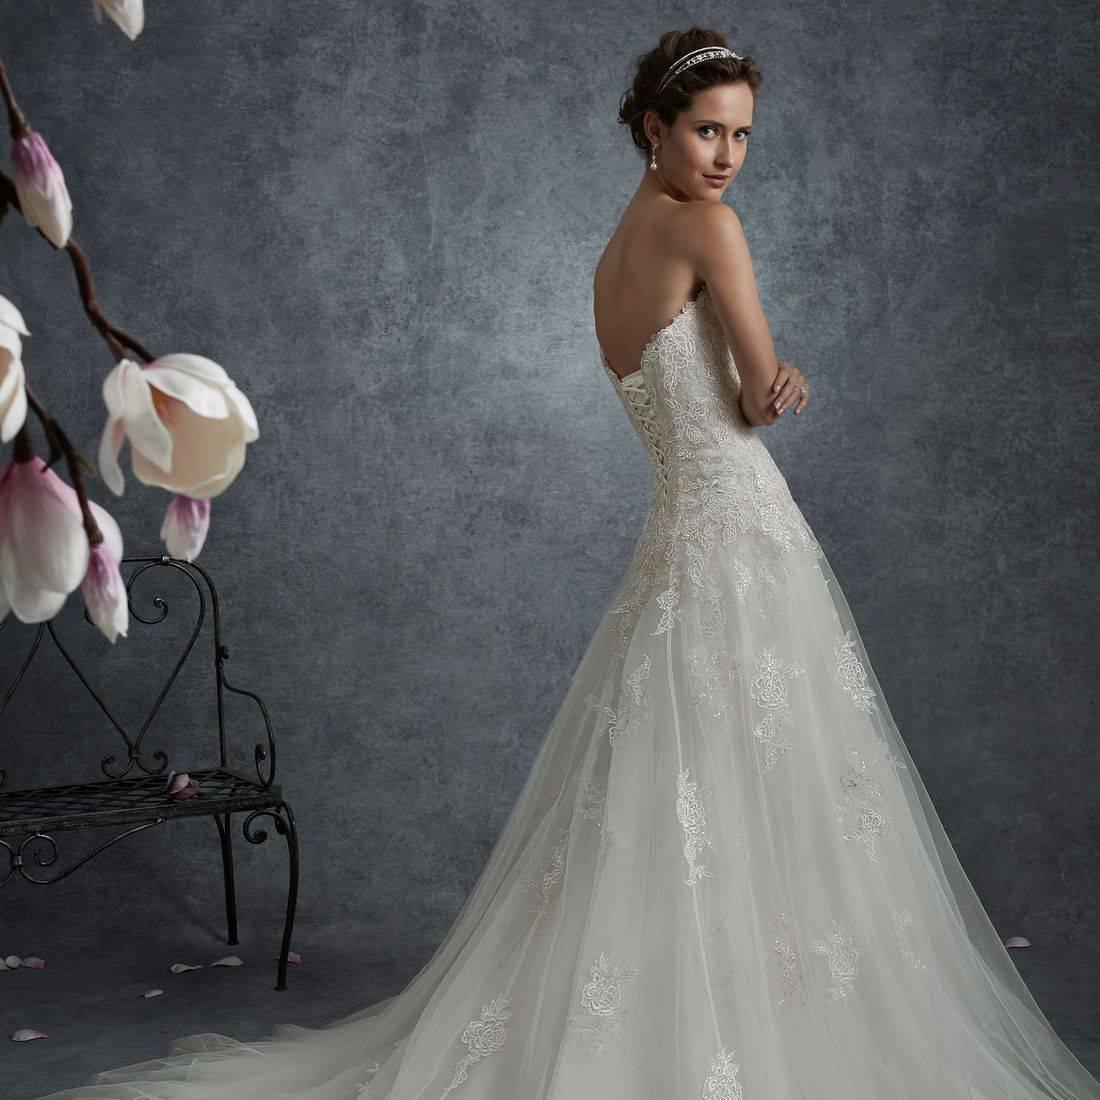 sophia tolli wedding dress, sophia tolli, aline wedding dress, sequin beaded lace wedding dress, deep sweetheart neckline wedding dress, flowy wedding dress, flattering wedding dress